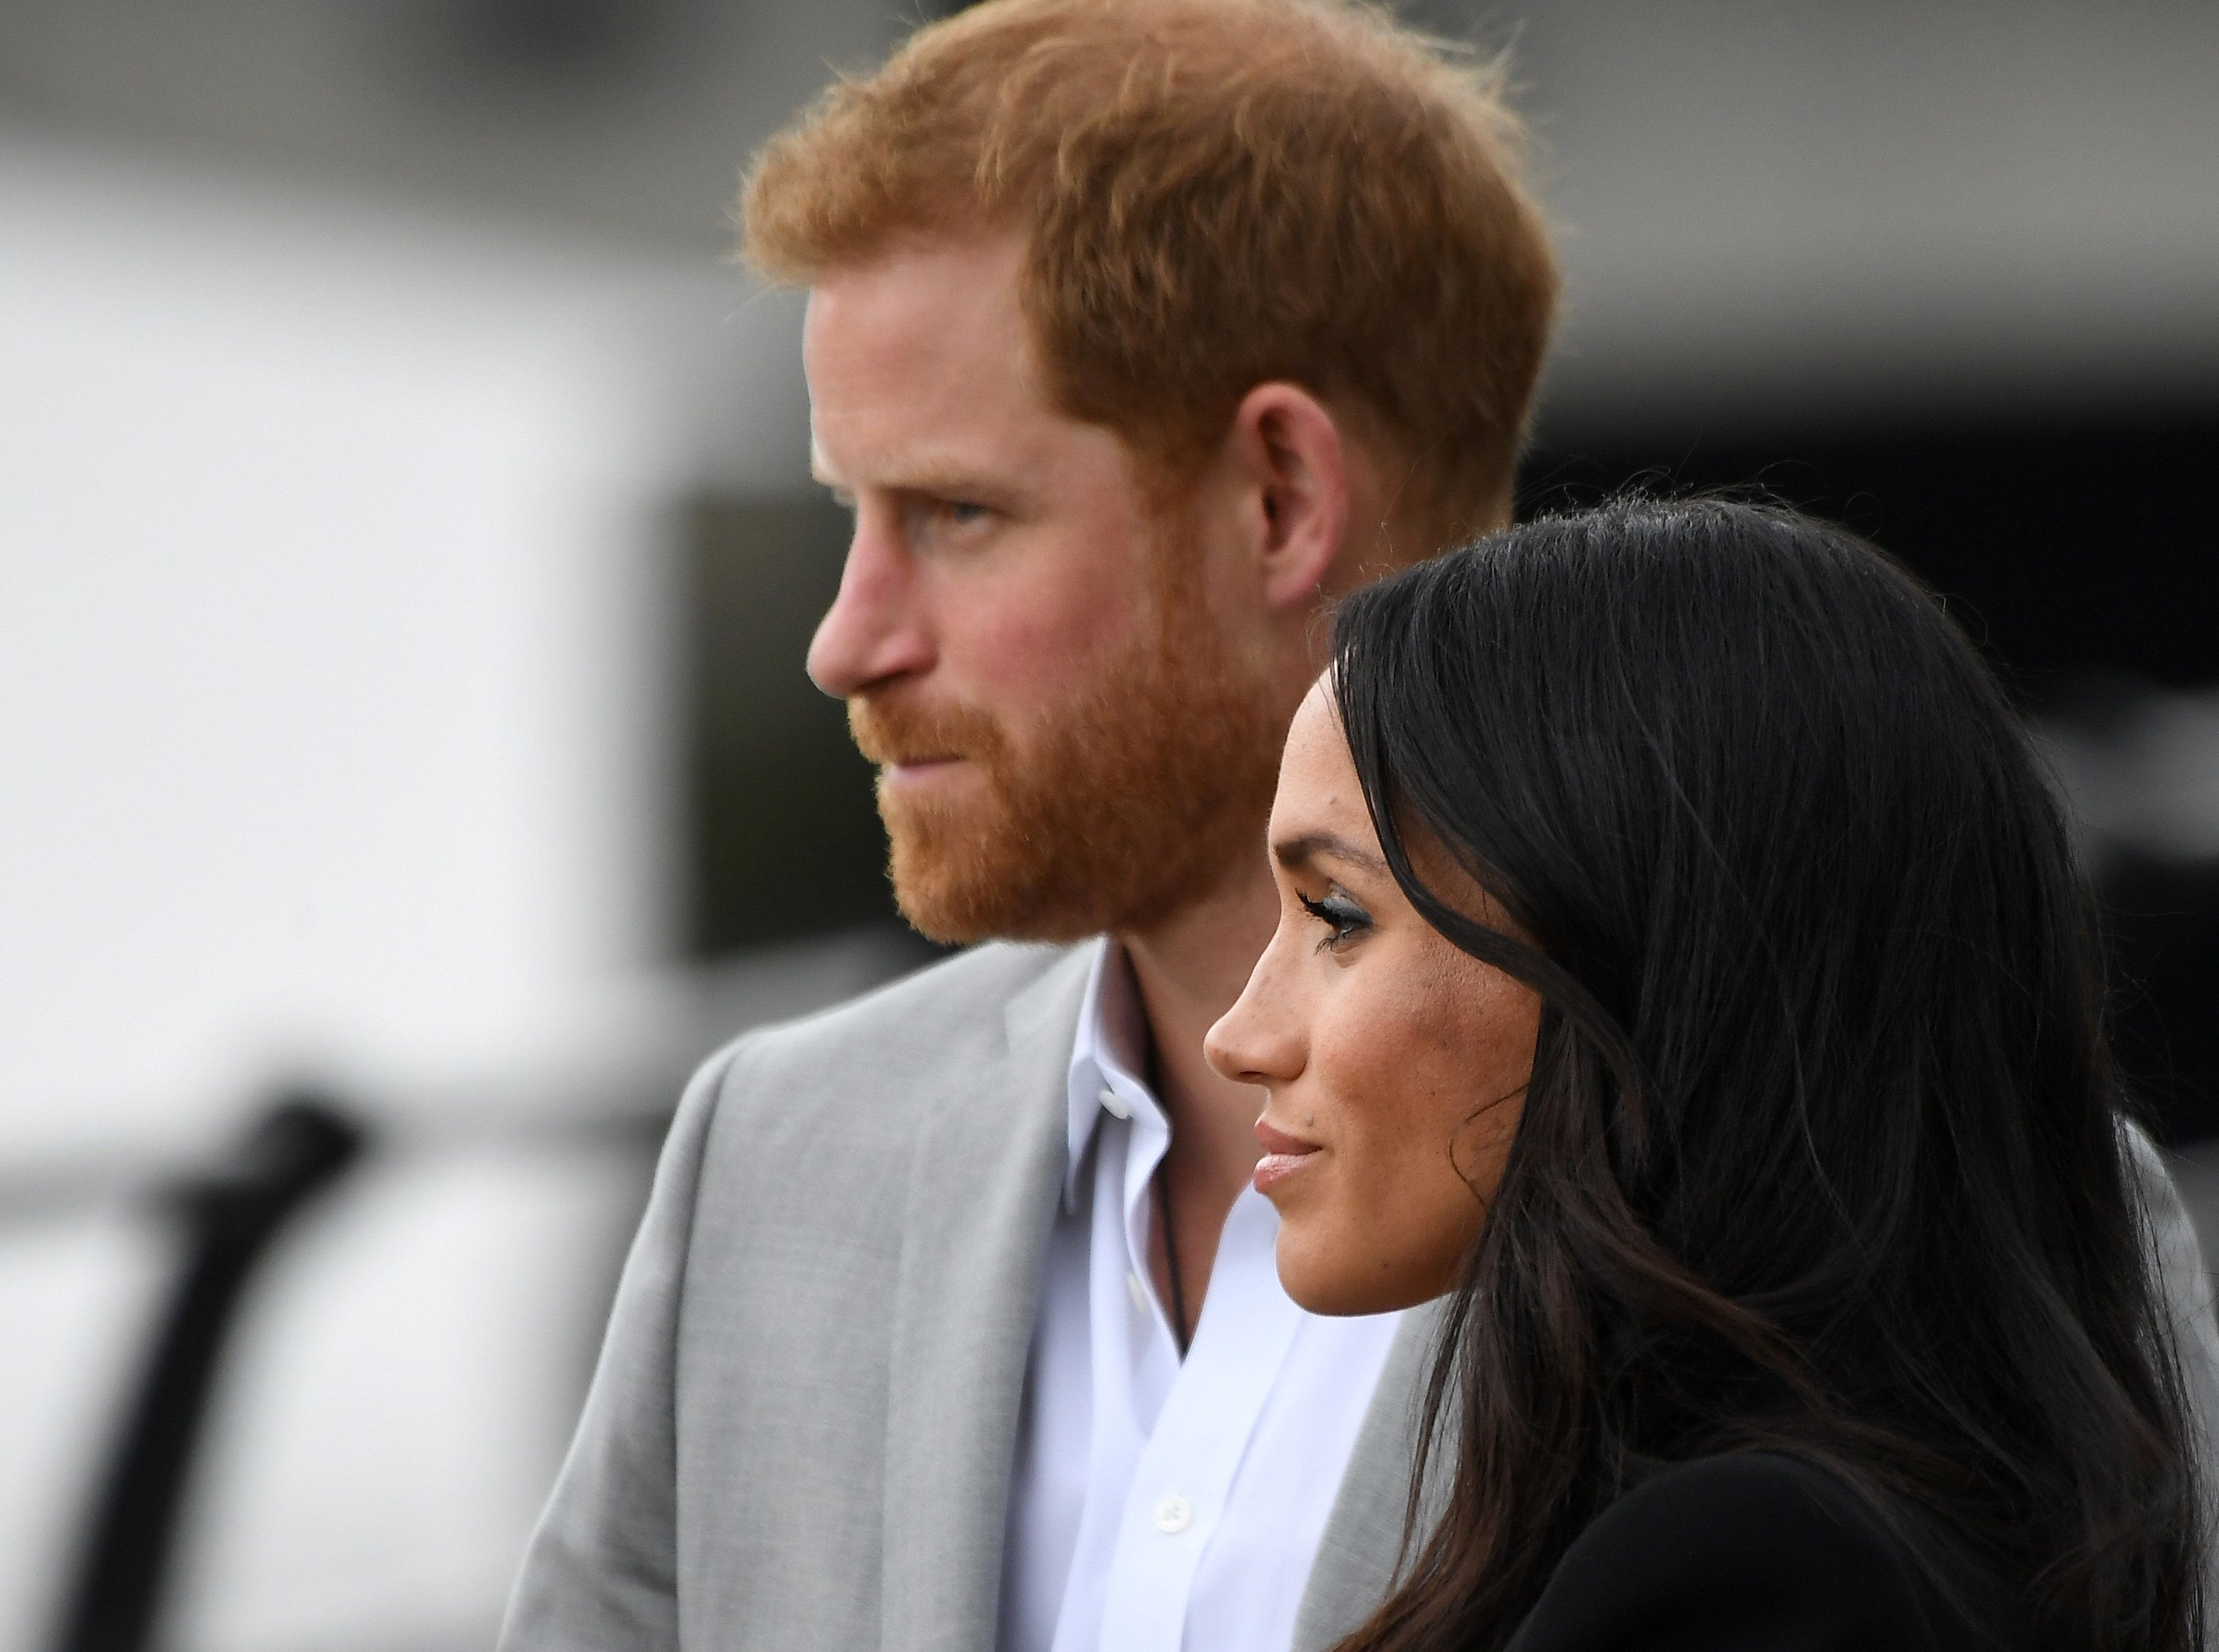 Royals: Stress bei Meghan und Harry – Meghans Hund soll den neuen Hund